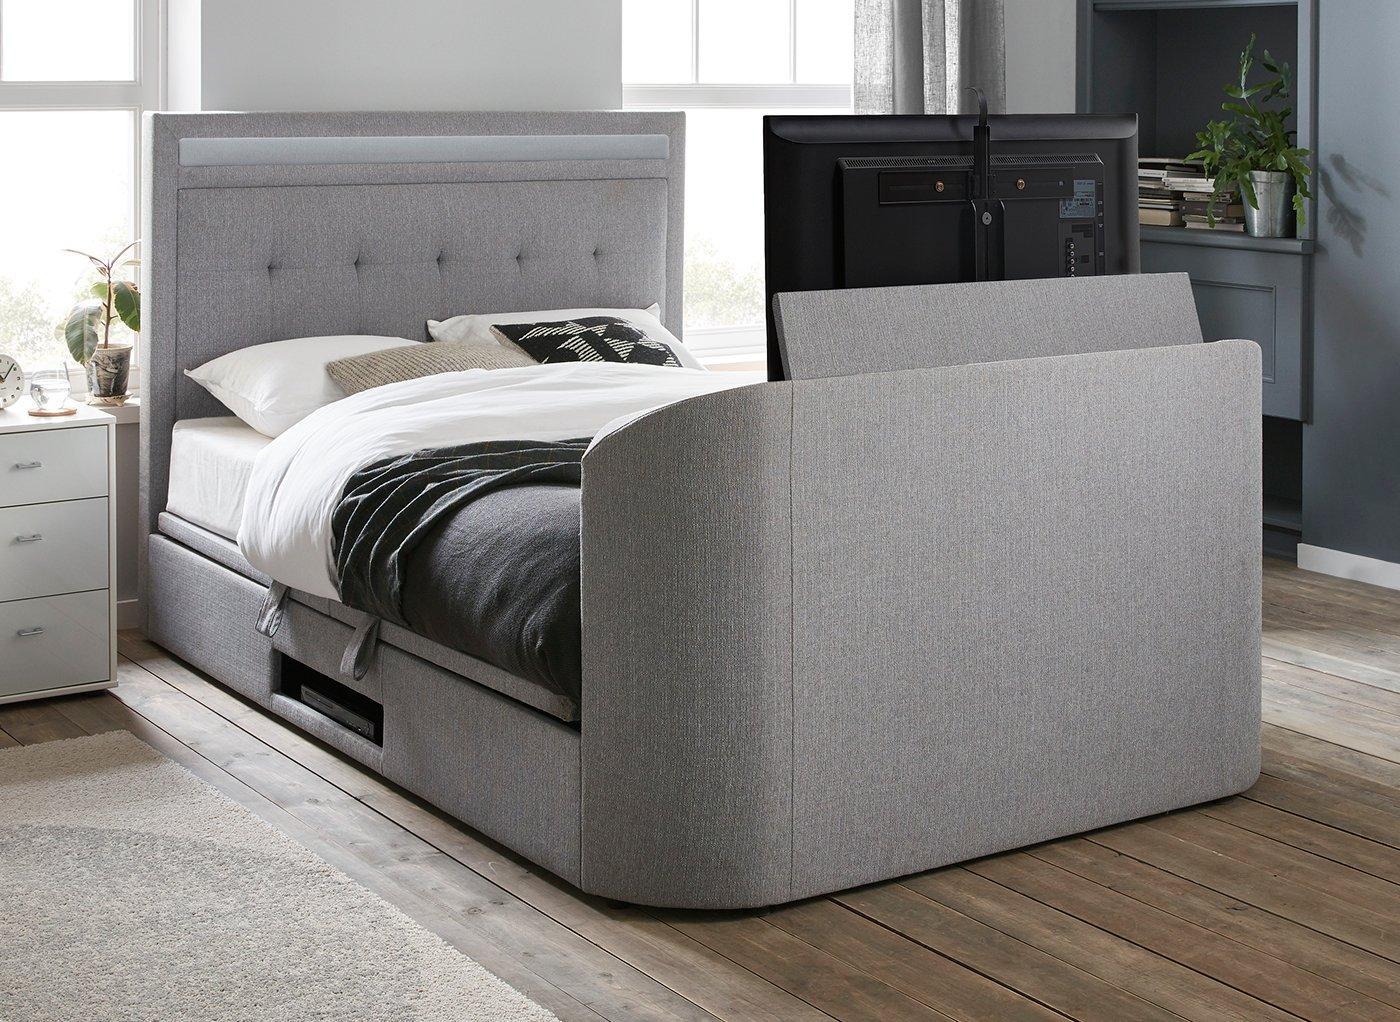 Tv In Bed : Elephant tv bed grey u i pod dock bluetooth speakers